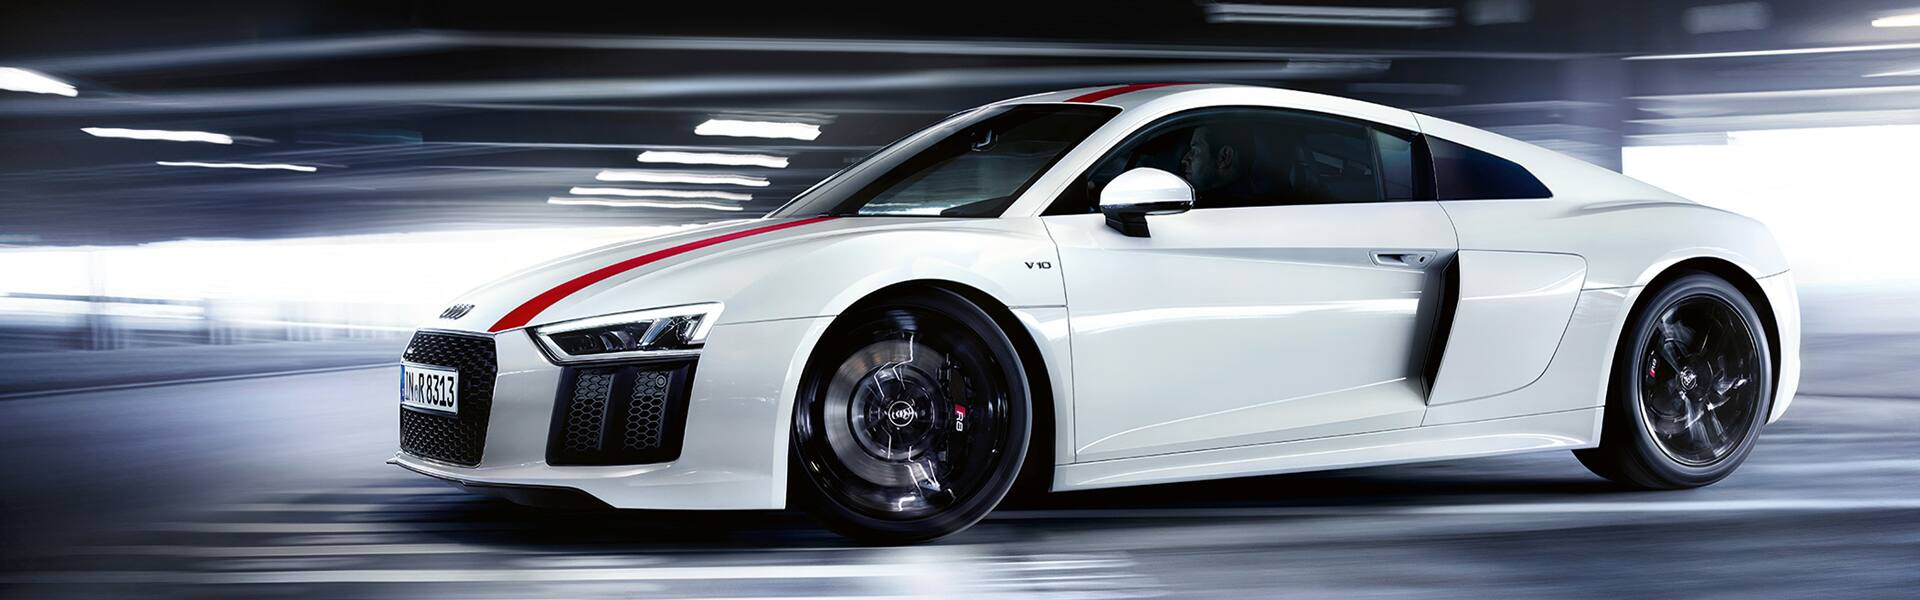 Audi R8 Coupe 2019 Audi R8 Range Audi Dubai